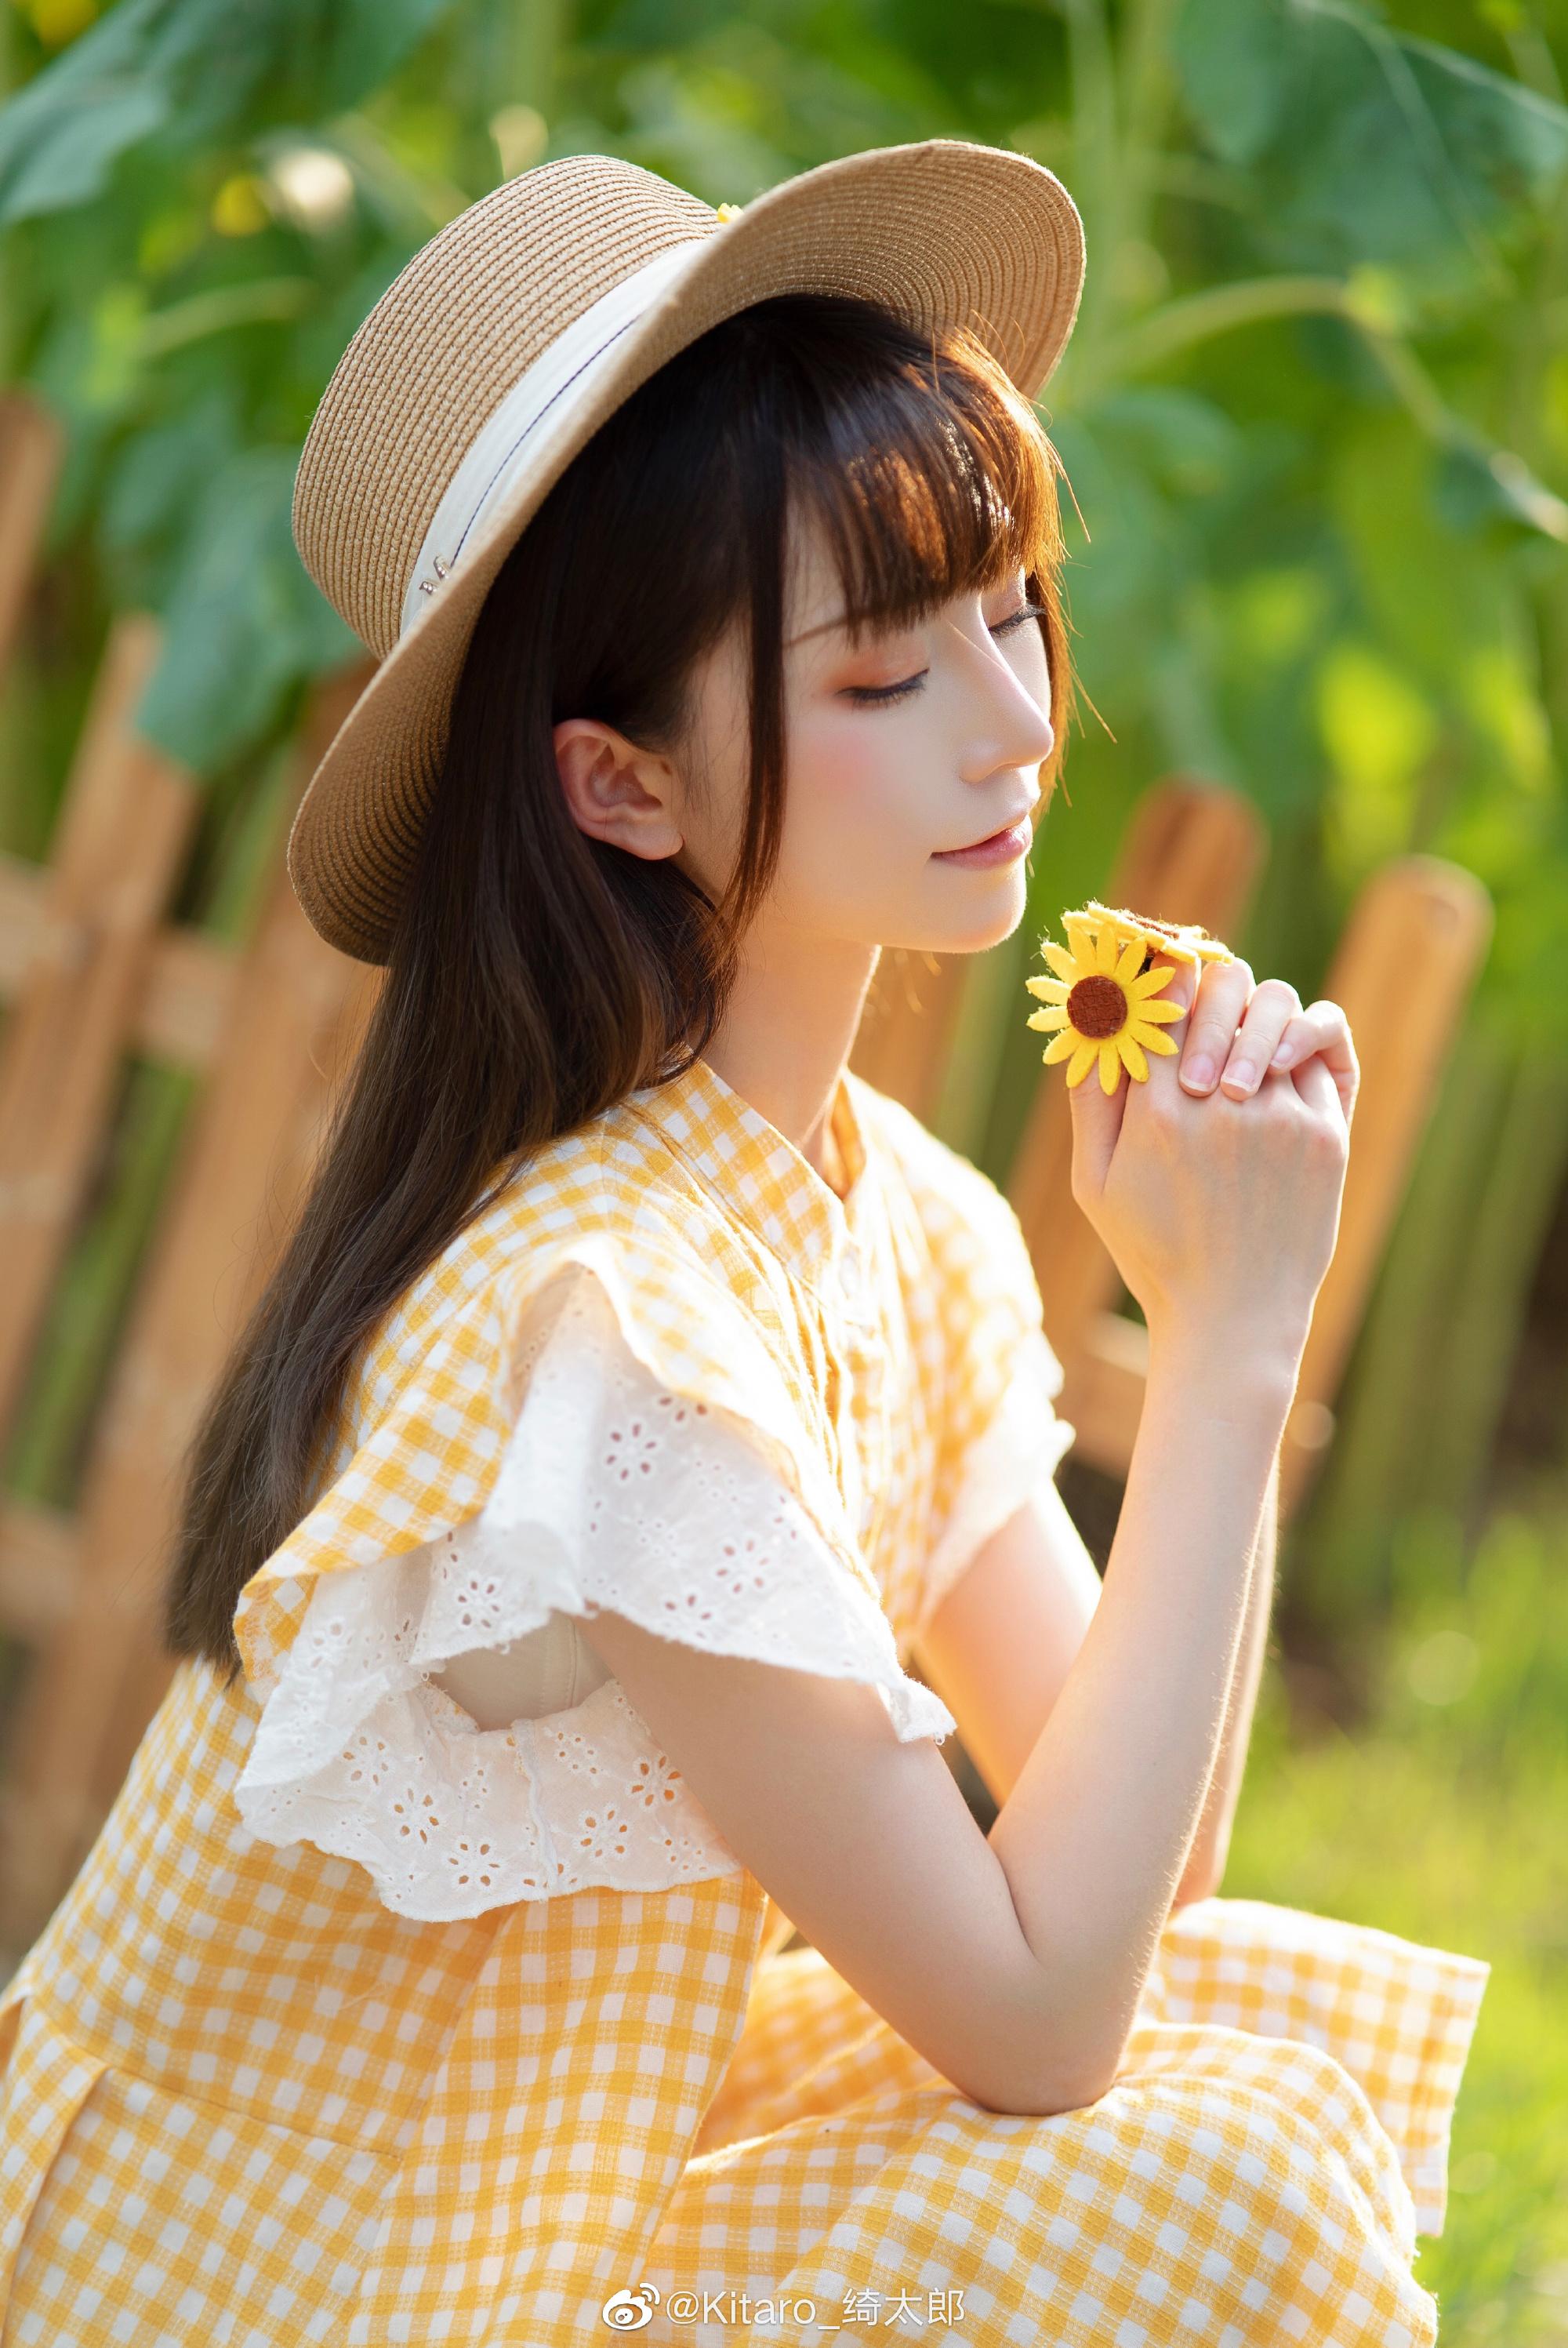 @Kitaro_绮太郎 你是小太阳吧?-觅爱图